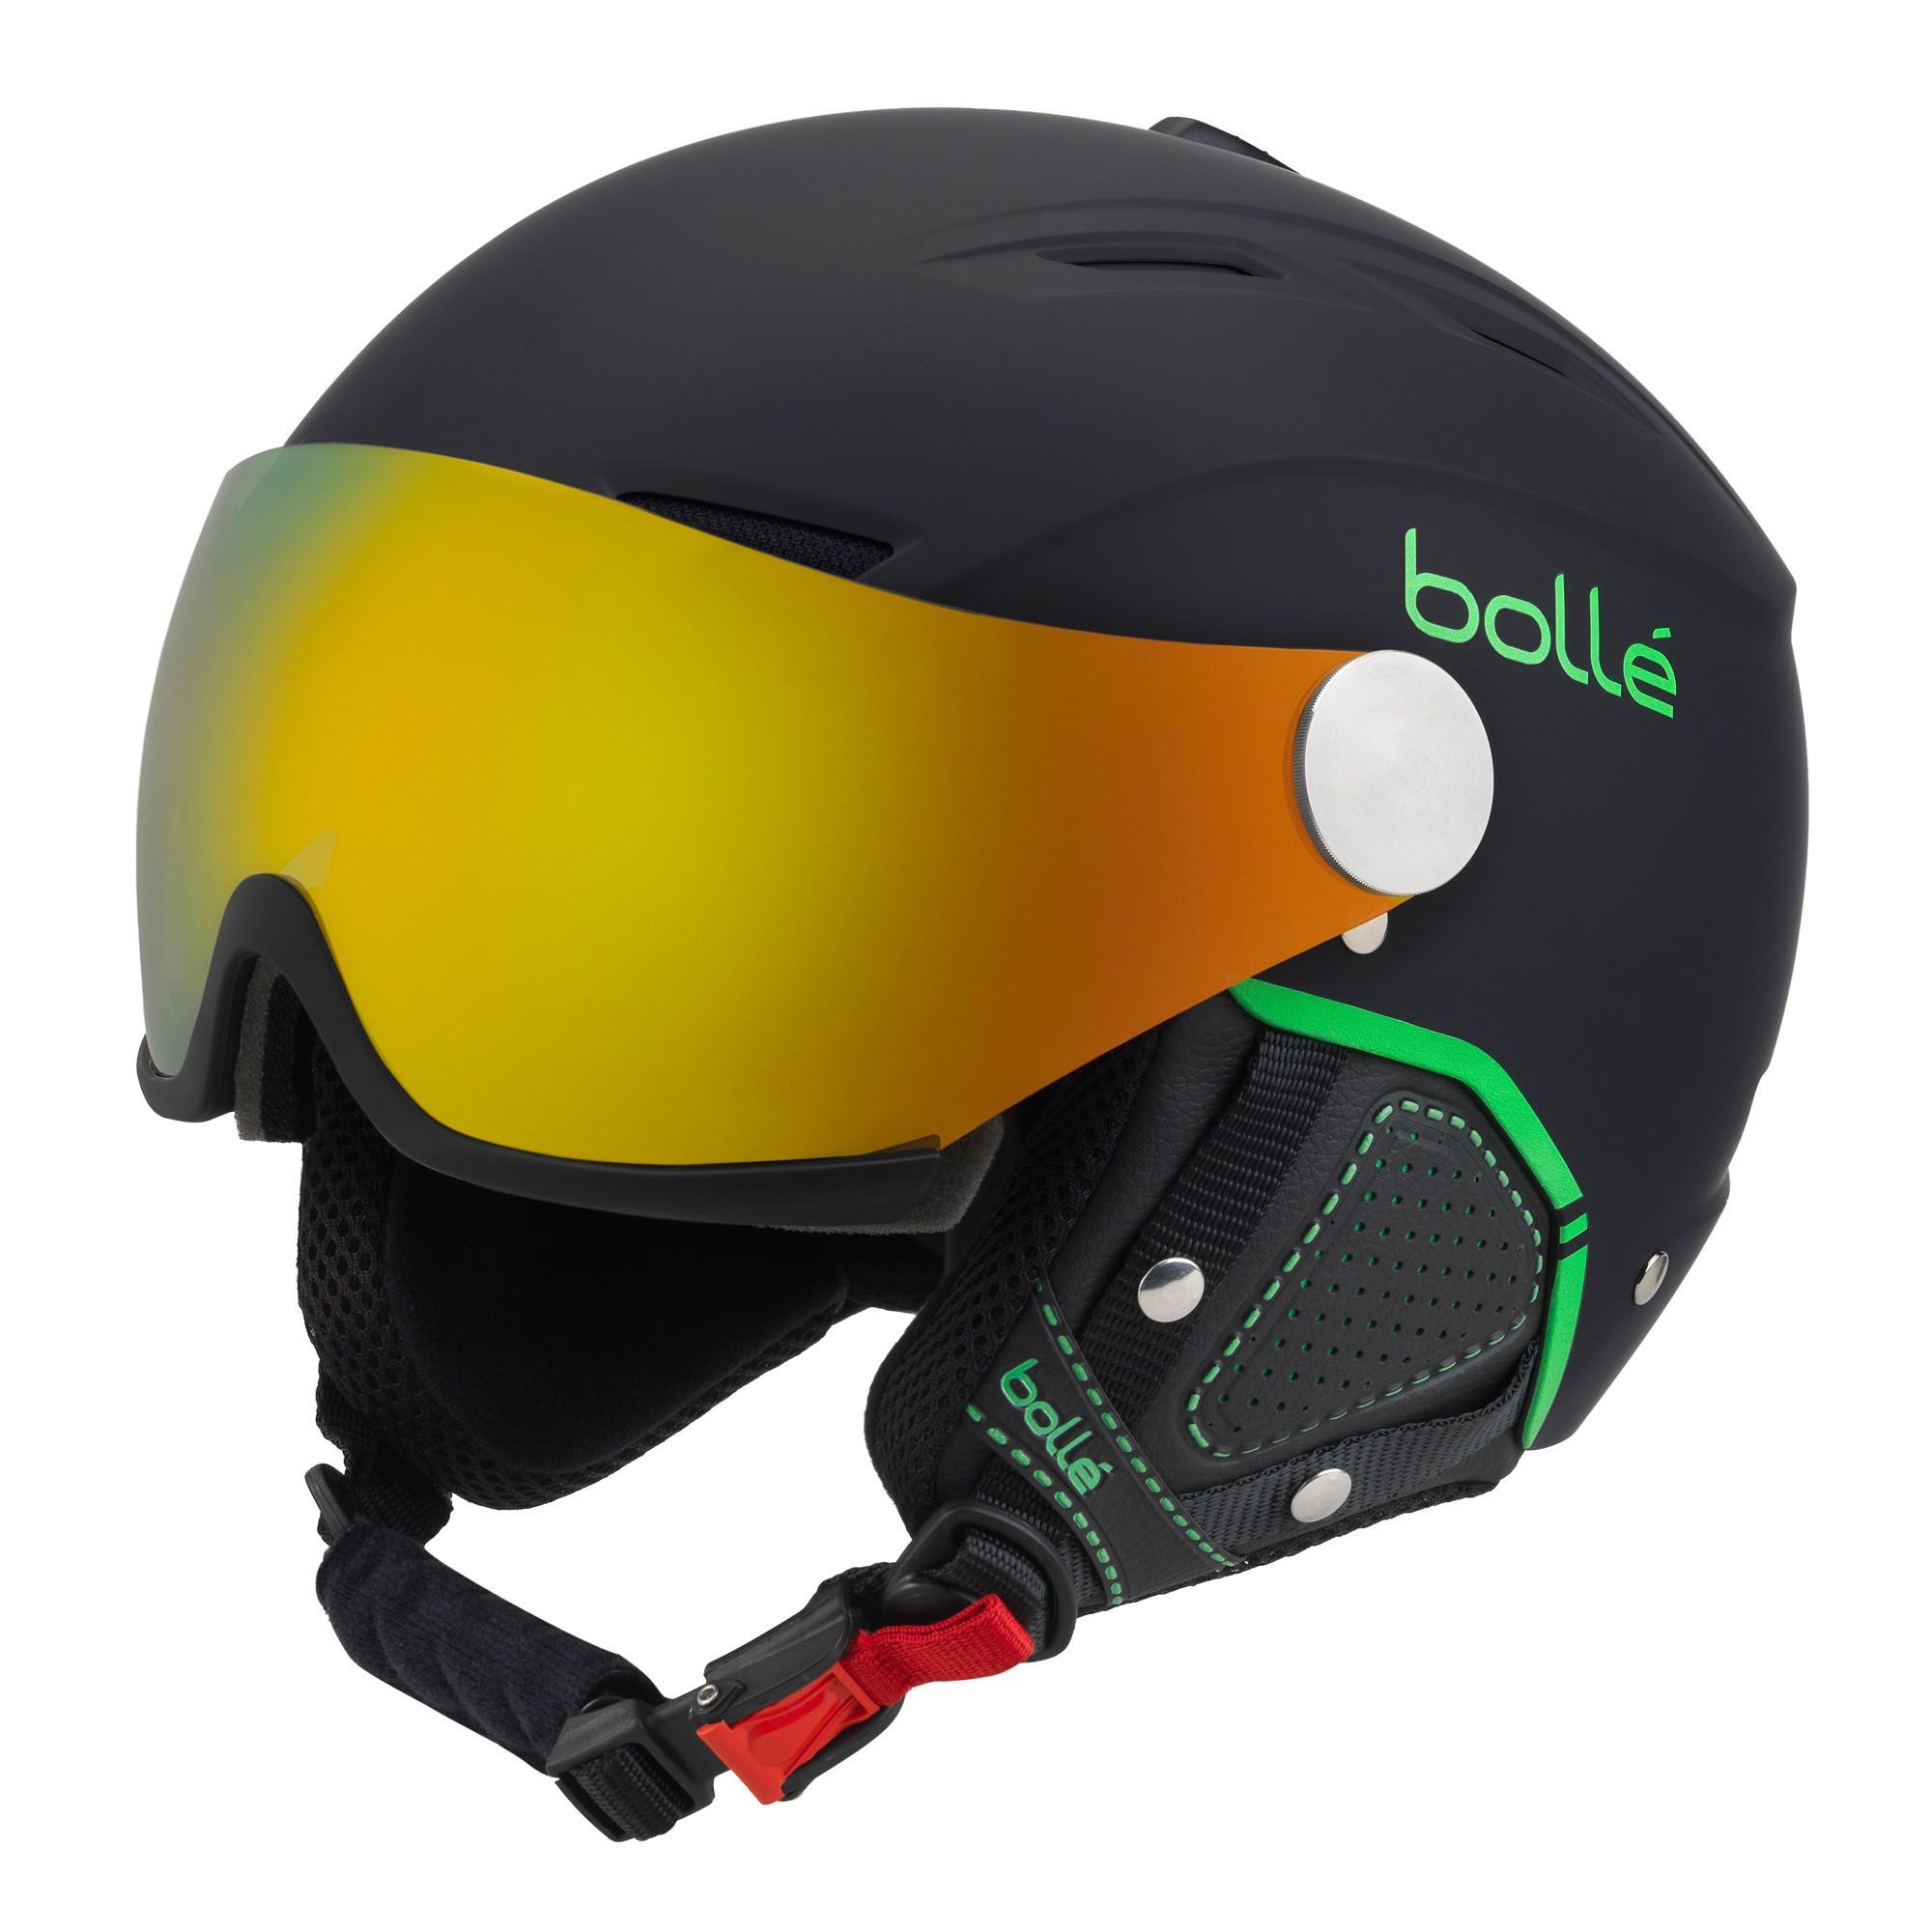 Afbeelding van Bollé Backline Visor Premium Helm Soft Black Green